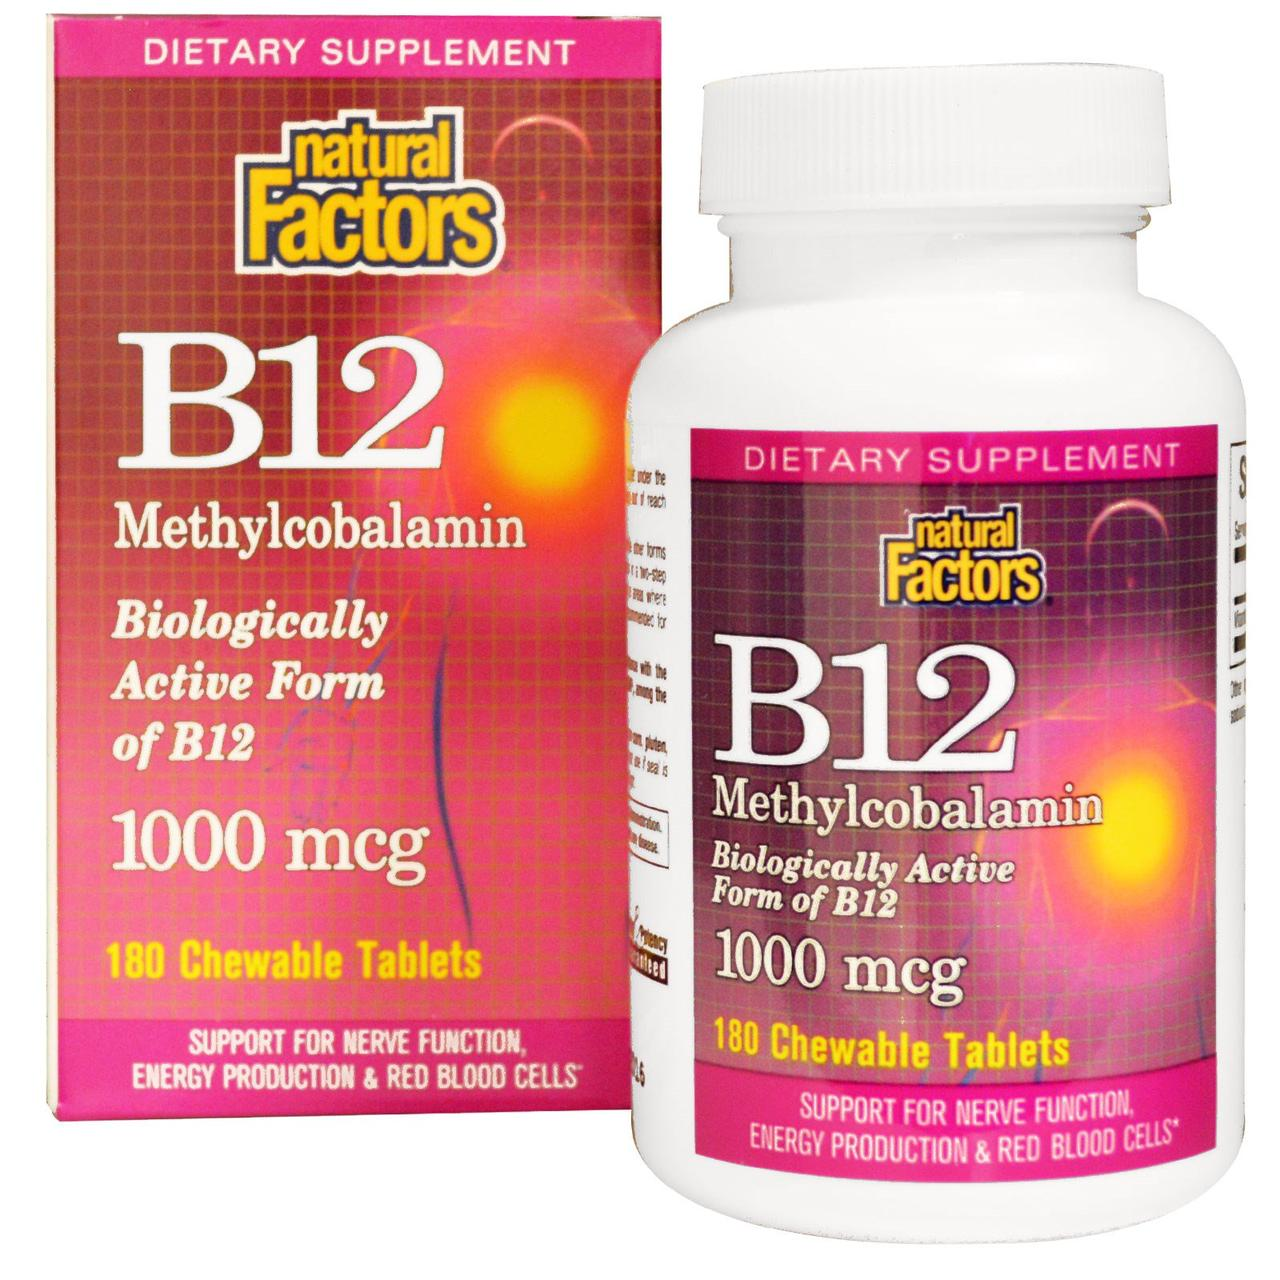 Natural Factors, B12 метилкобаламин, 1000 мкг, 180 жевательных таблеток